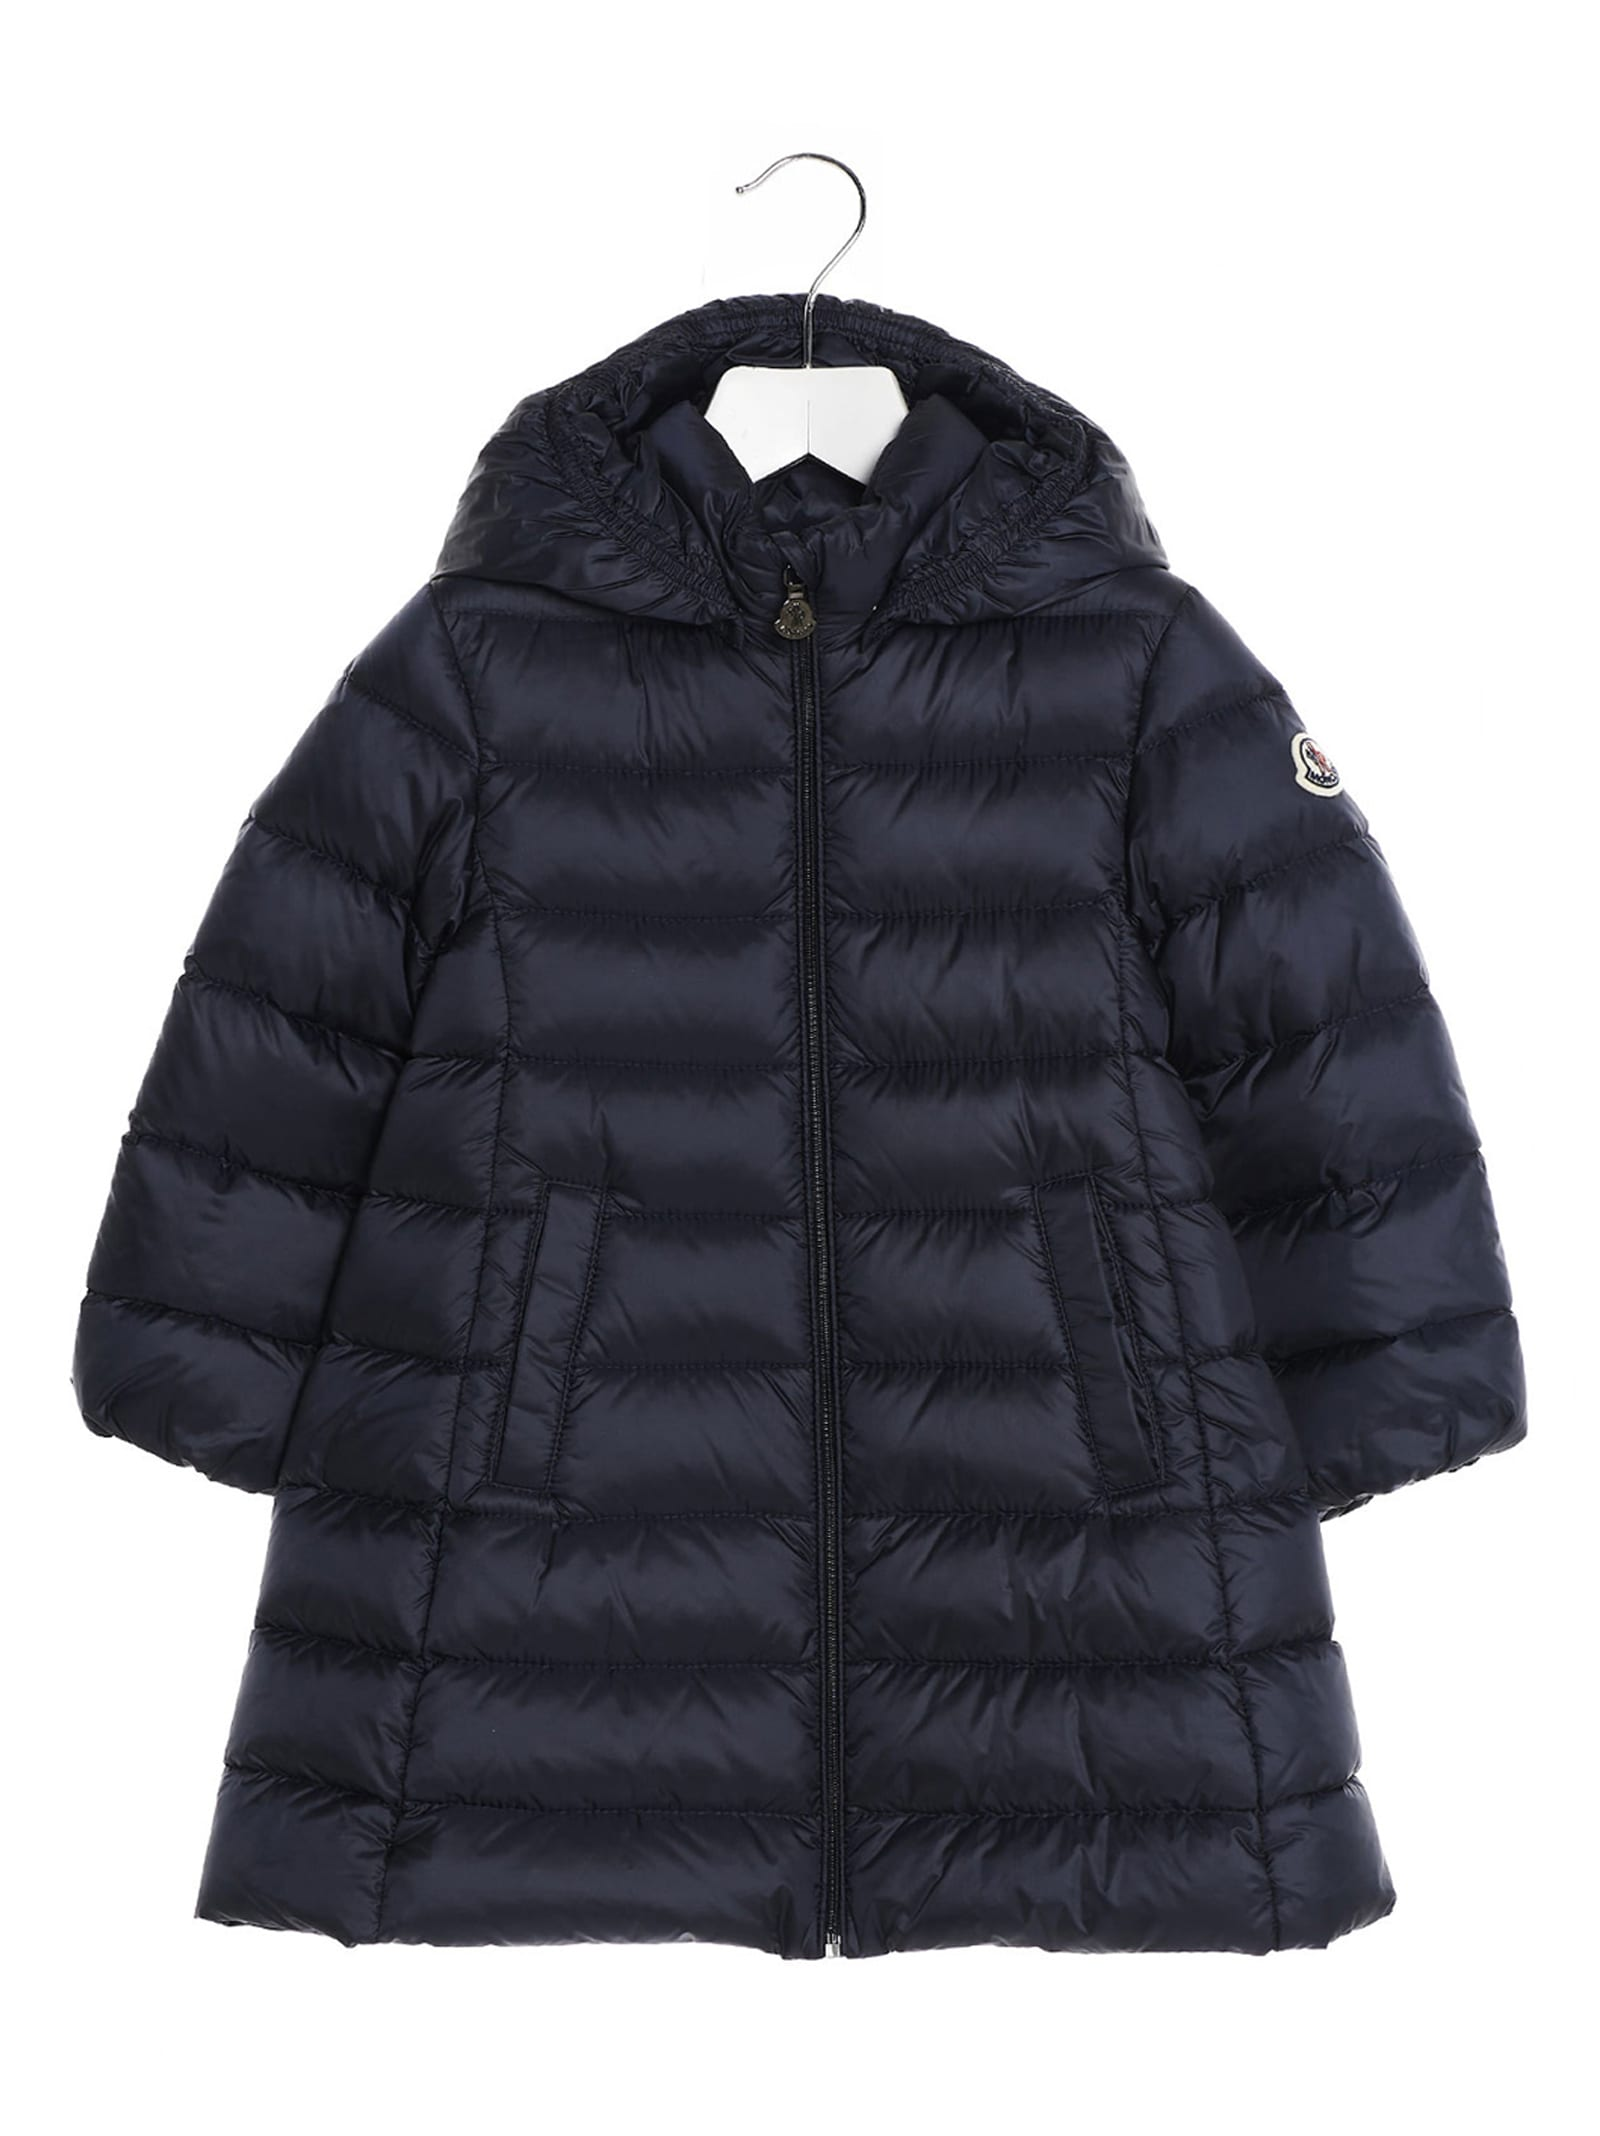 Moncler majeure Jacket